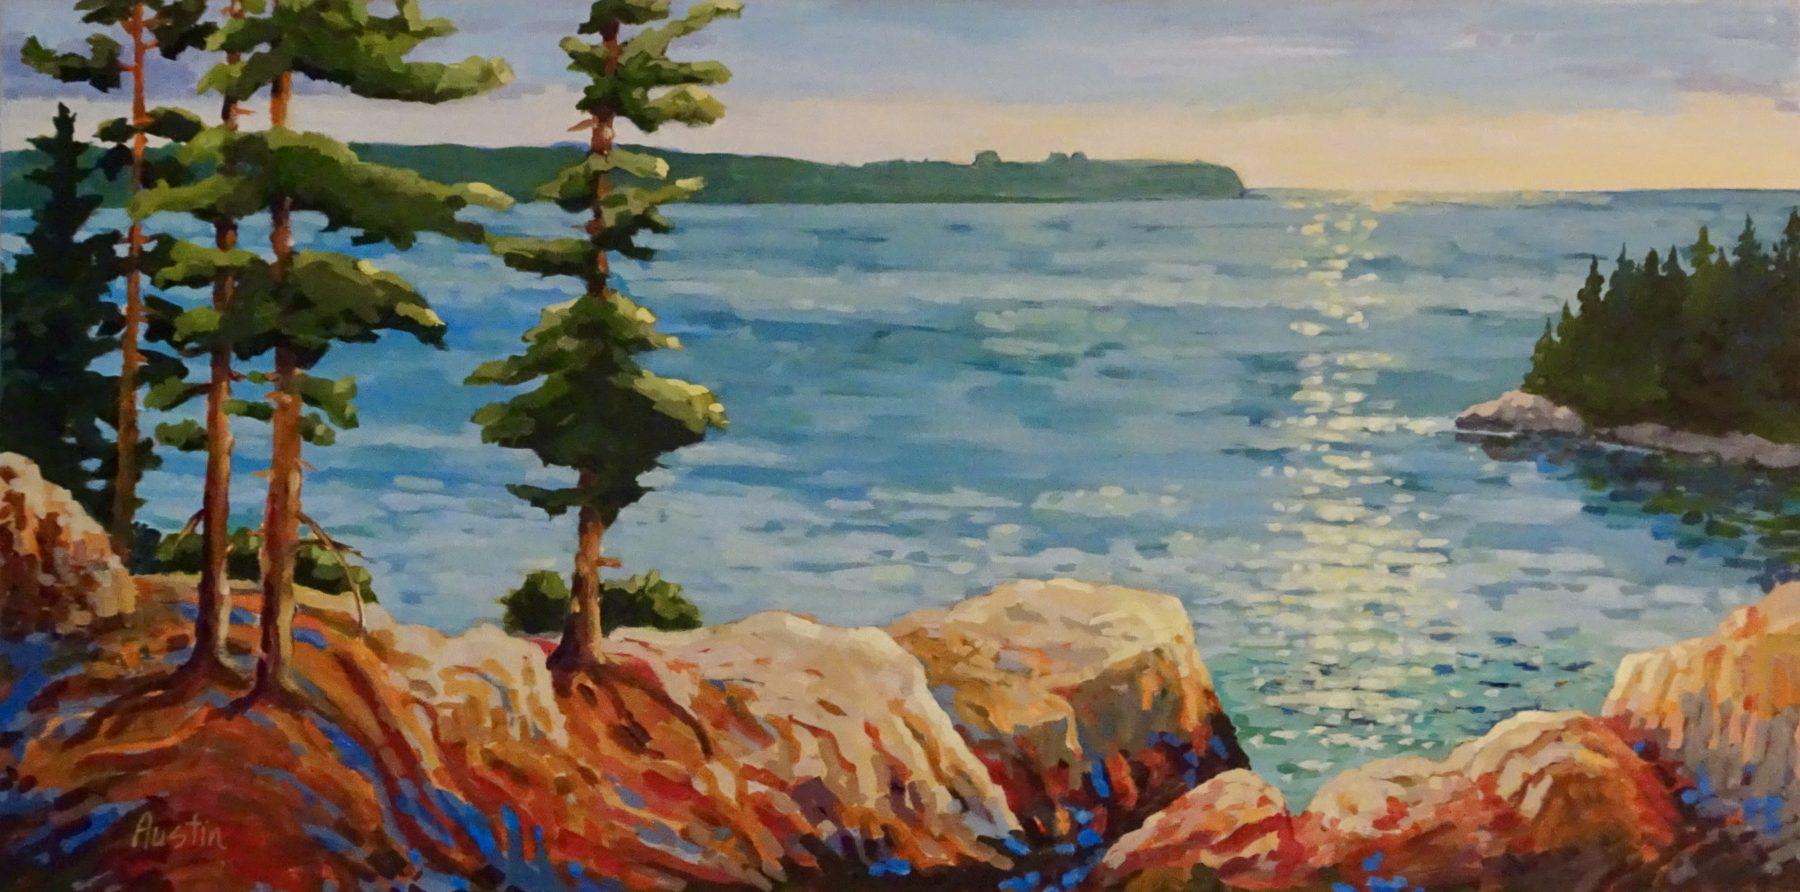 Caulfeild Rocks 30 x 48 acrylic on canvas - sold